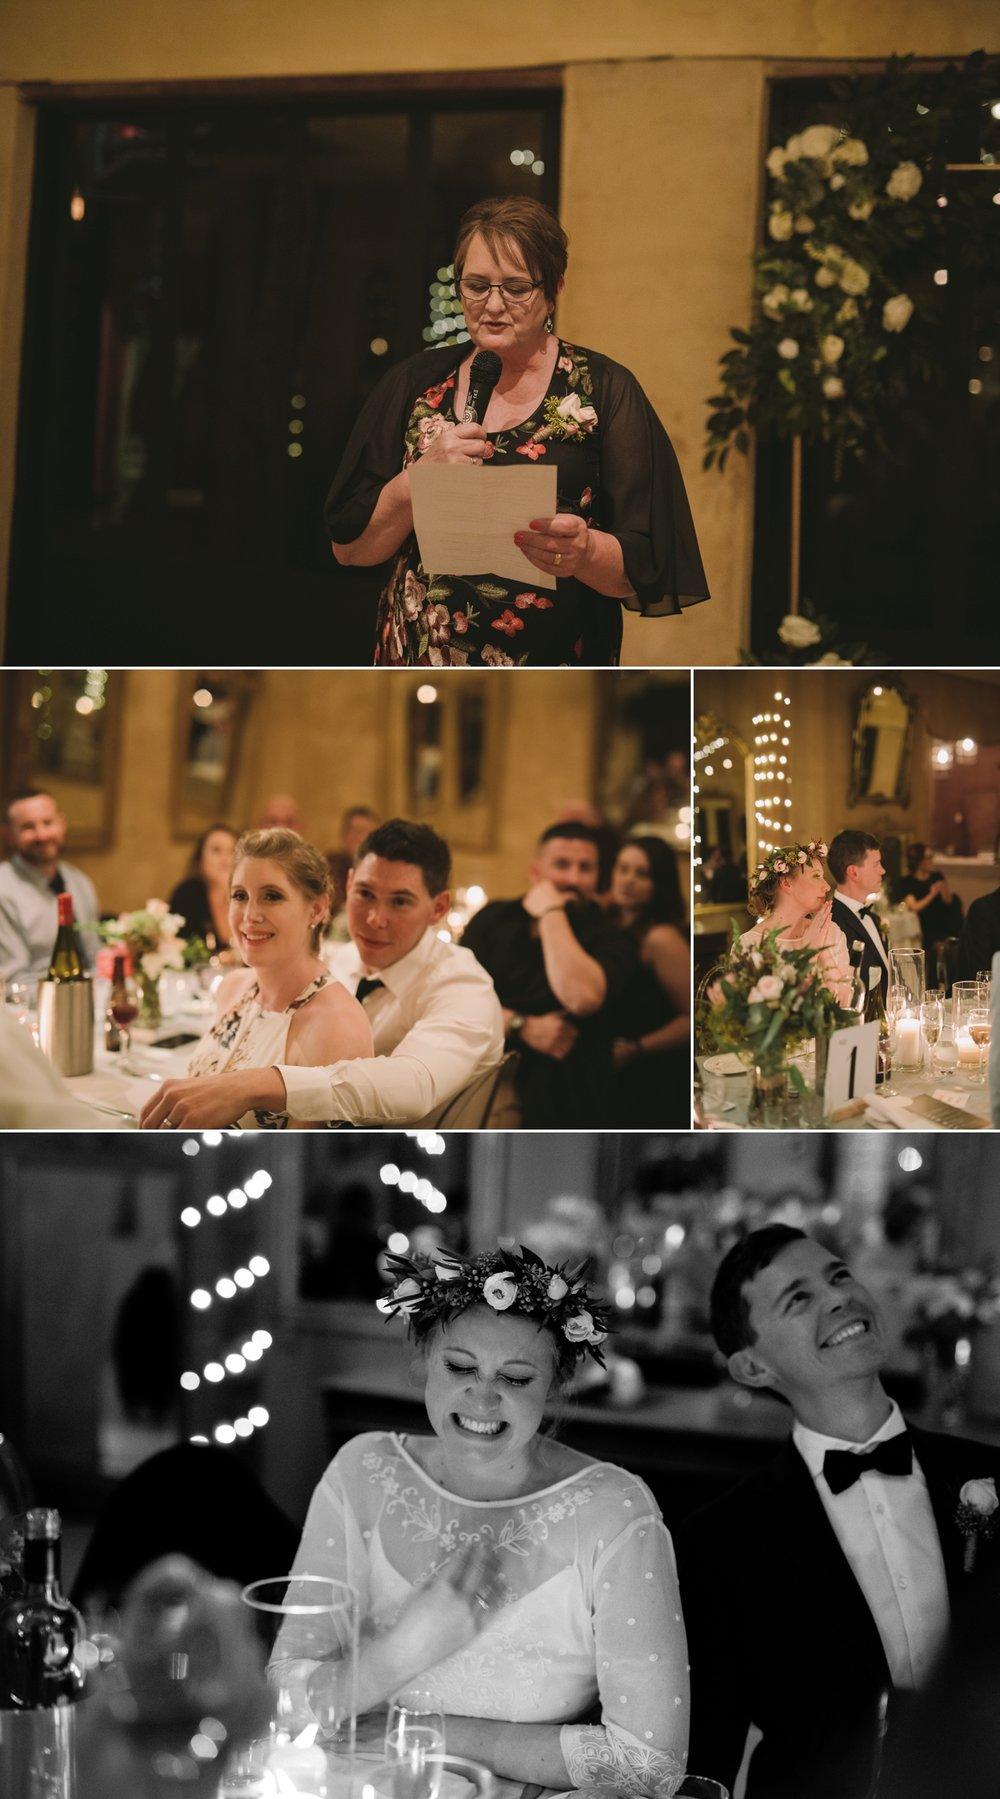 Jo & Aaron - Natural Wedding Photography in Adelaide - Beautiful, modern wedding photographer - Al Ru Farm Wedding Photography - Katherine Schultz_0044.jpg